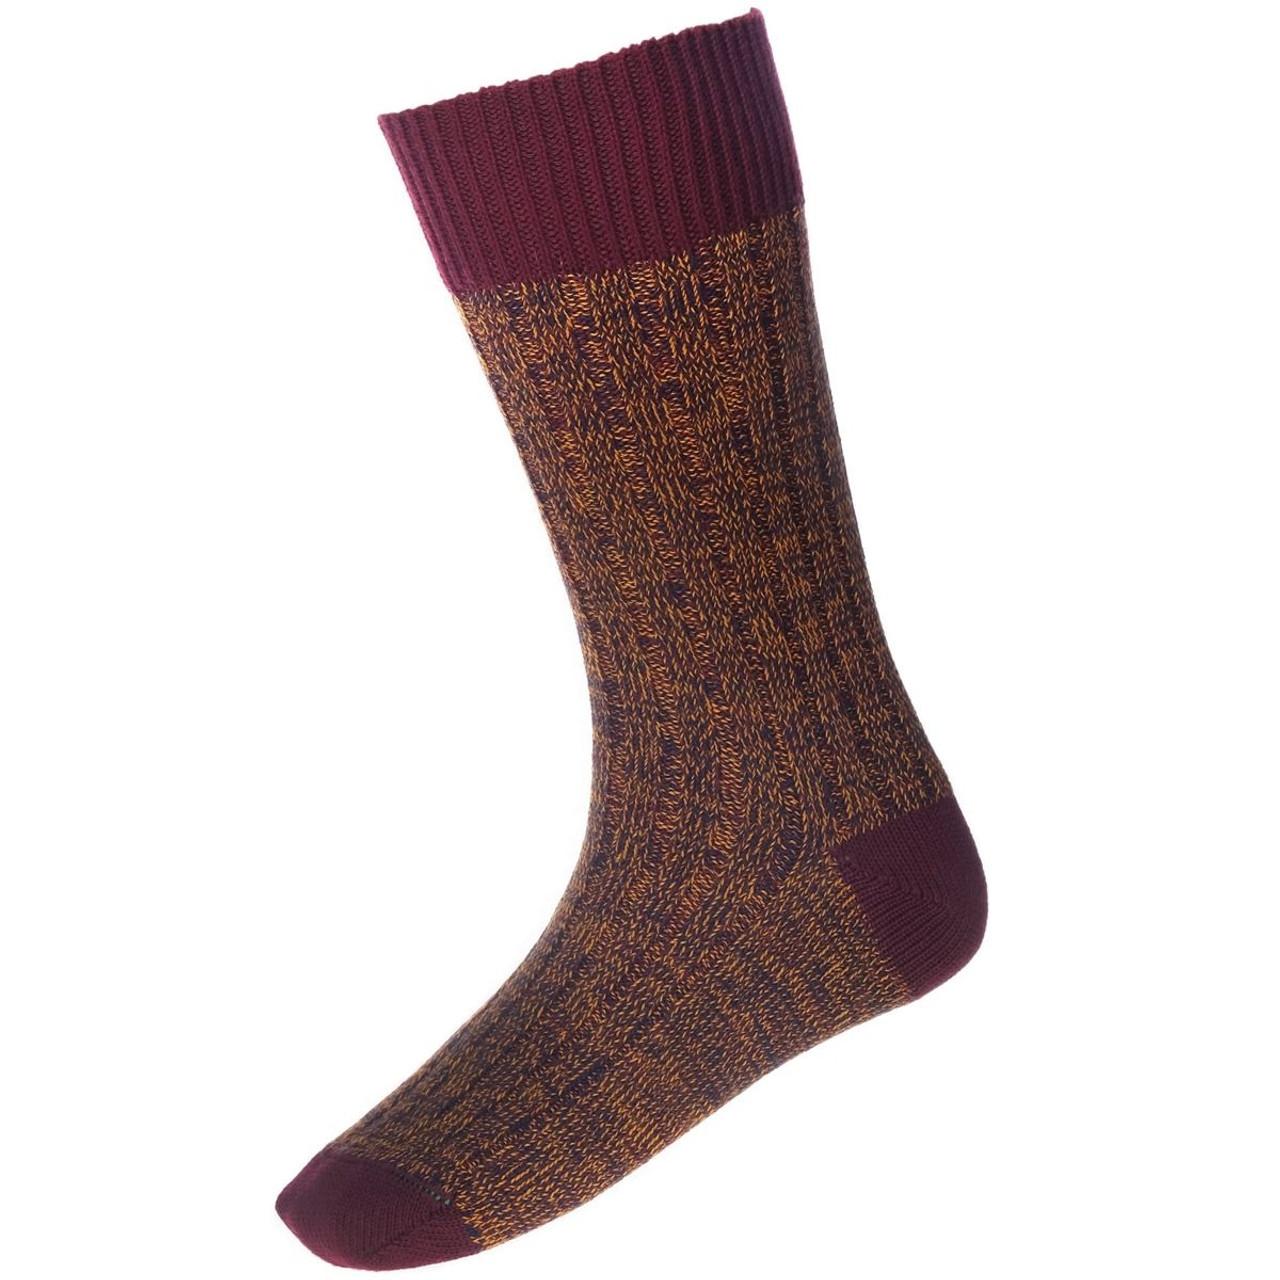 Burgundy - House Of Cheviot Firth Boot Socks